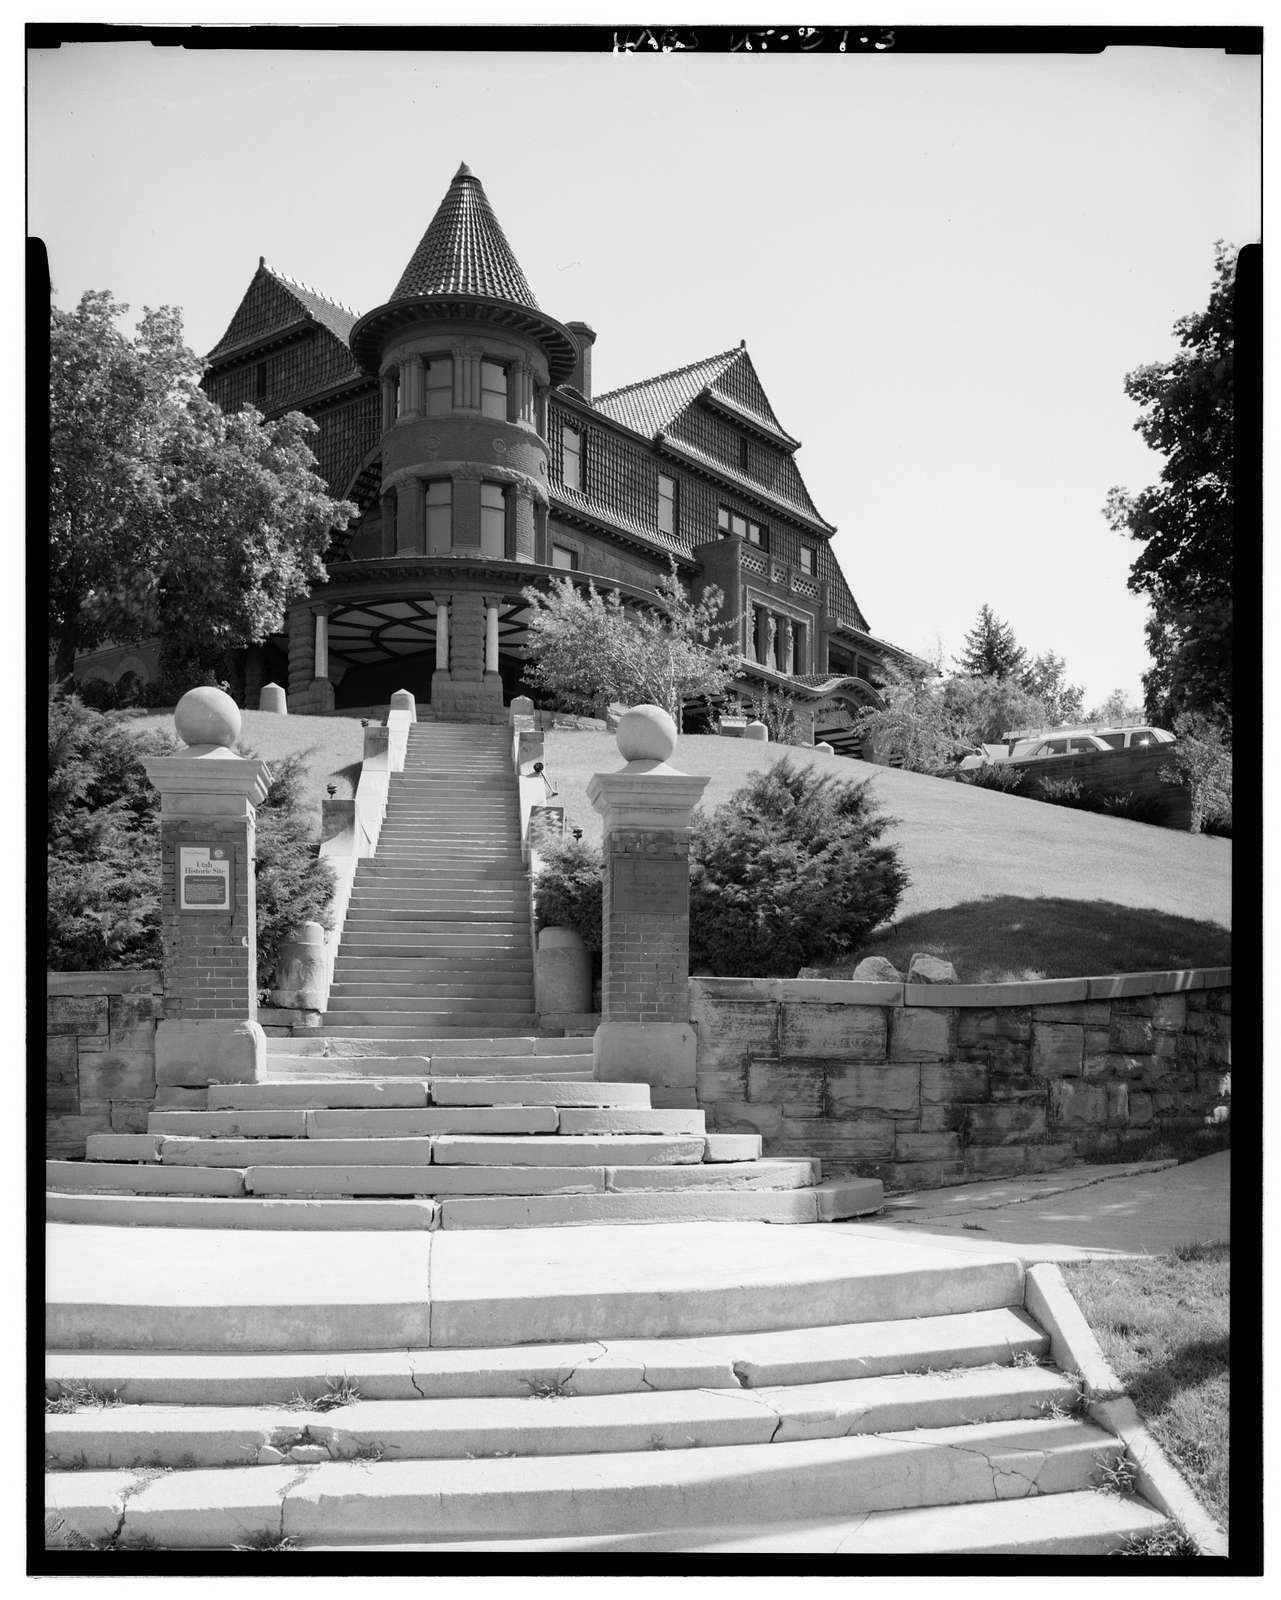 Alfred W. McCune House, 200 North Main Street, Salt Lake City, Salt Lake County, UT